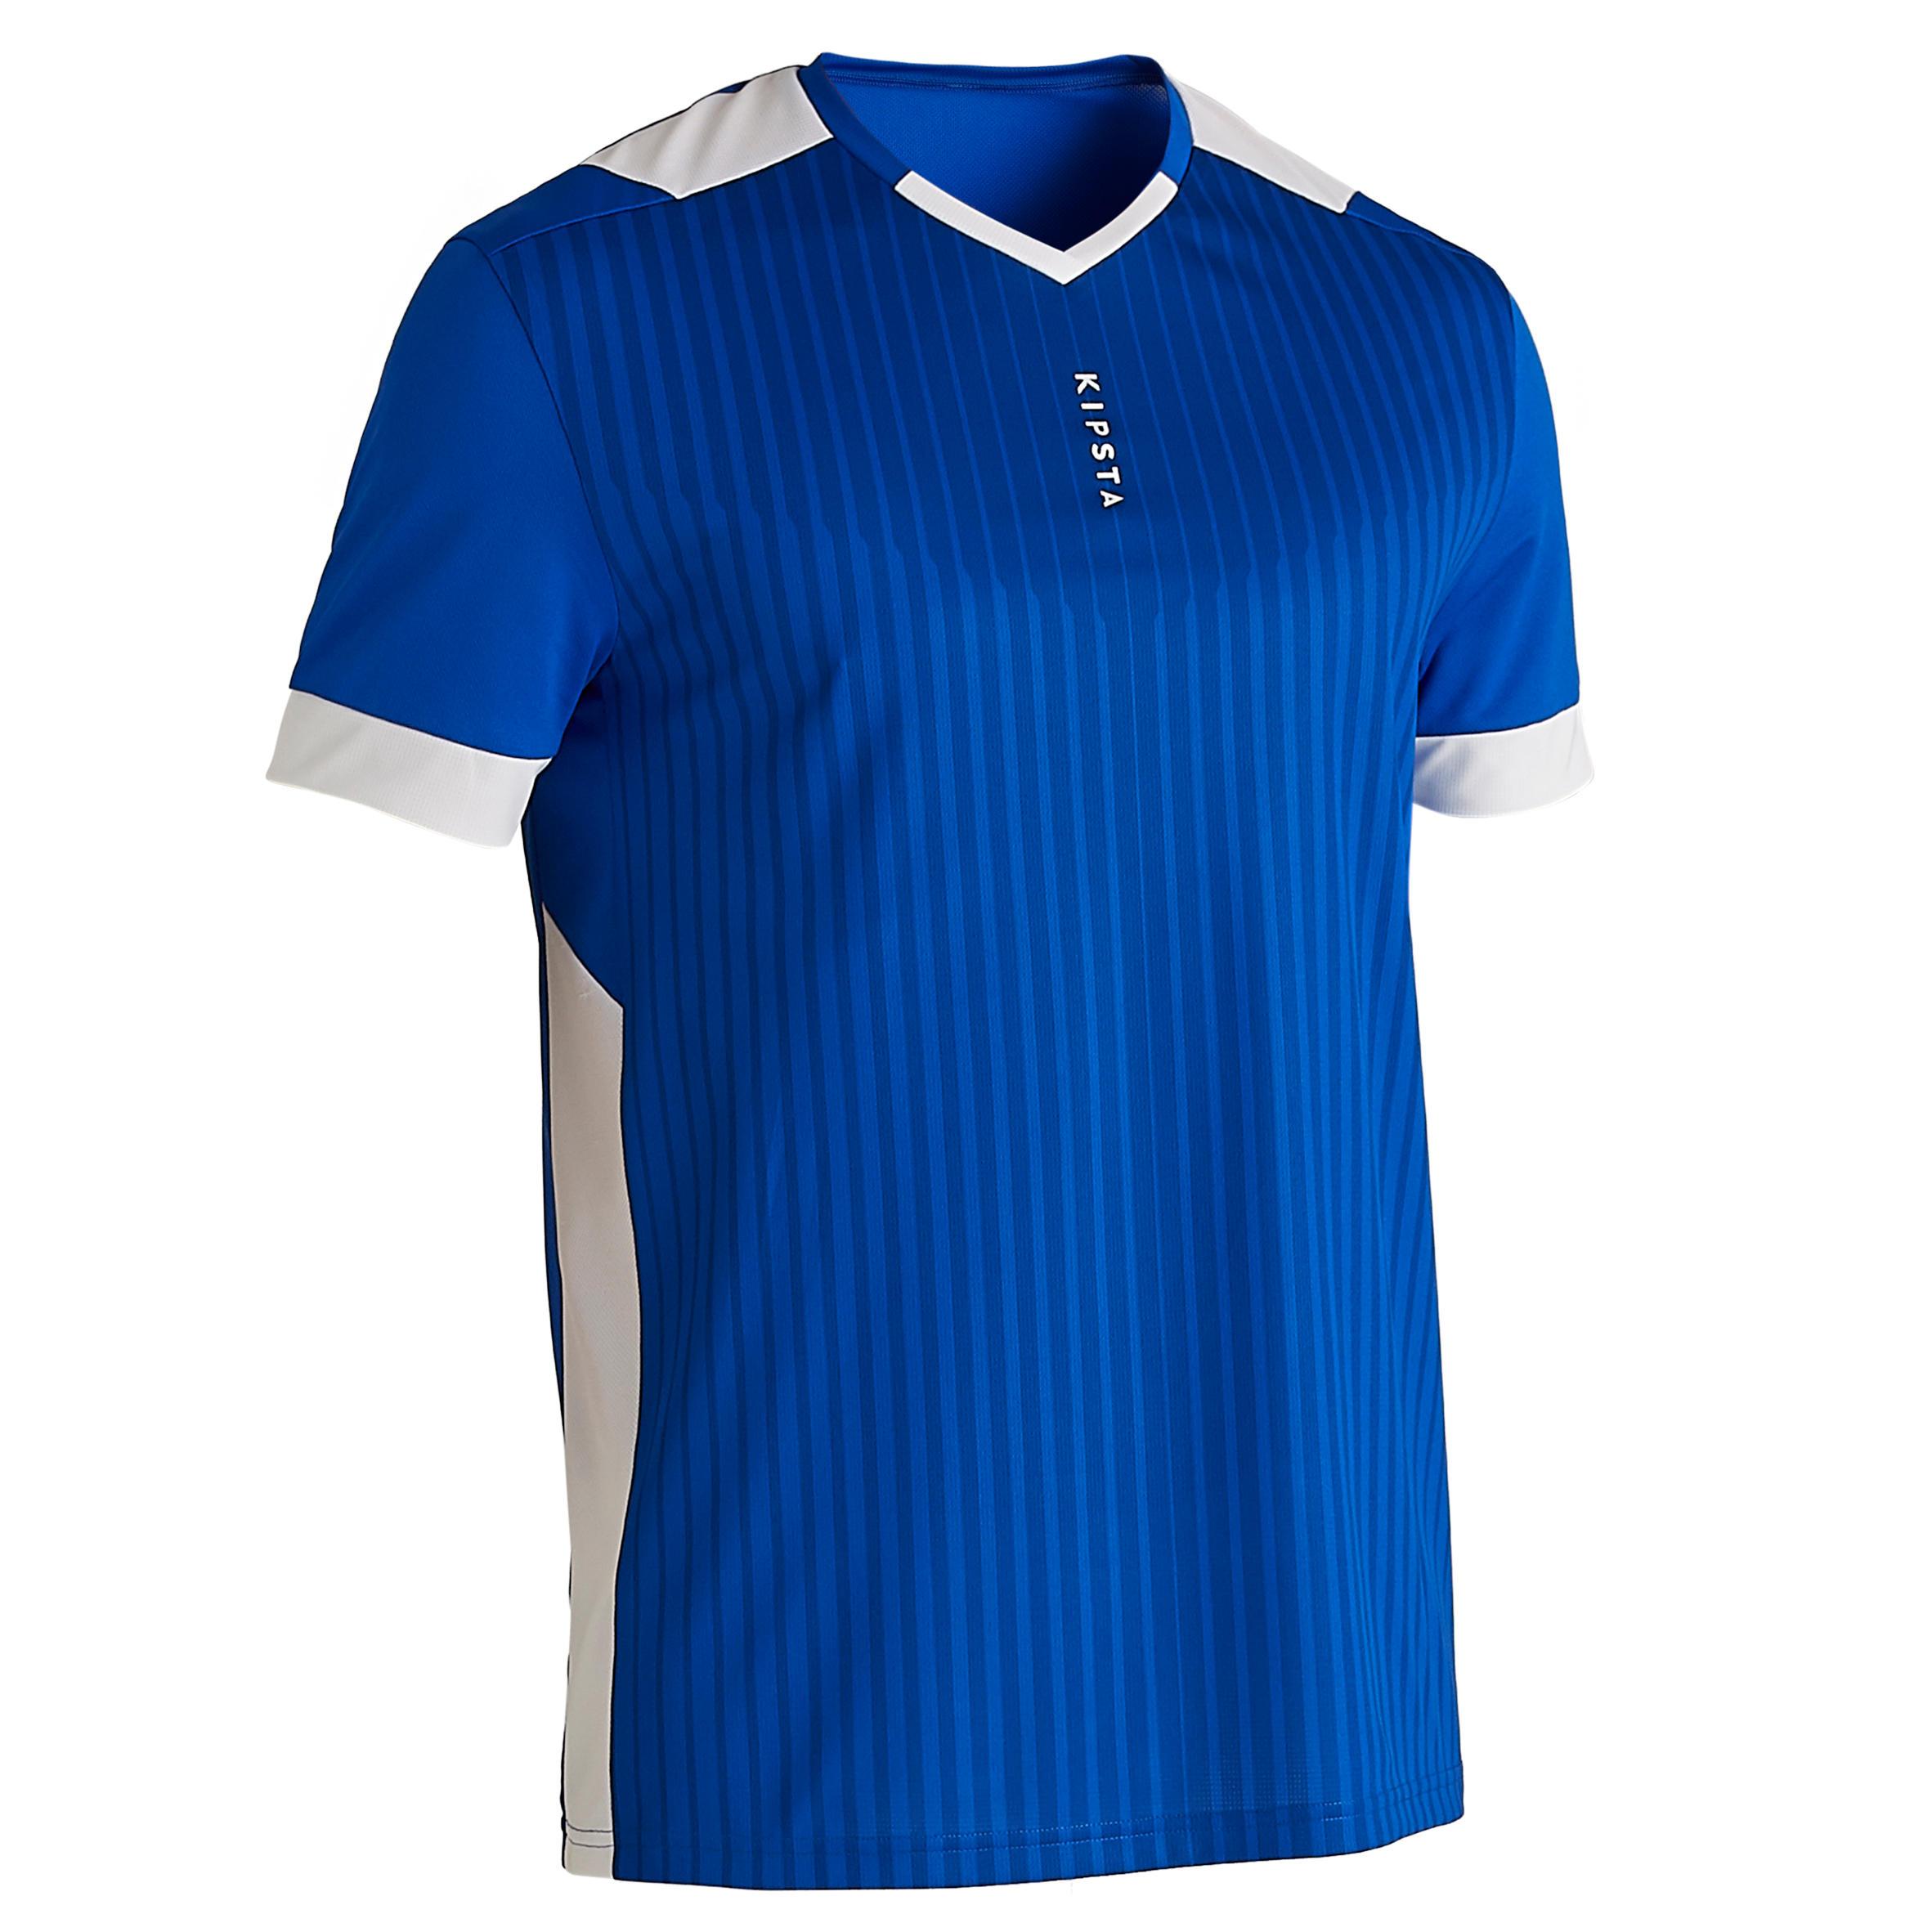 Tricou Fotbal F500 Adulţi la Reducere poza